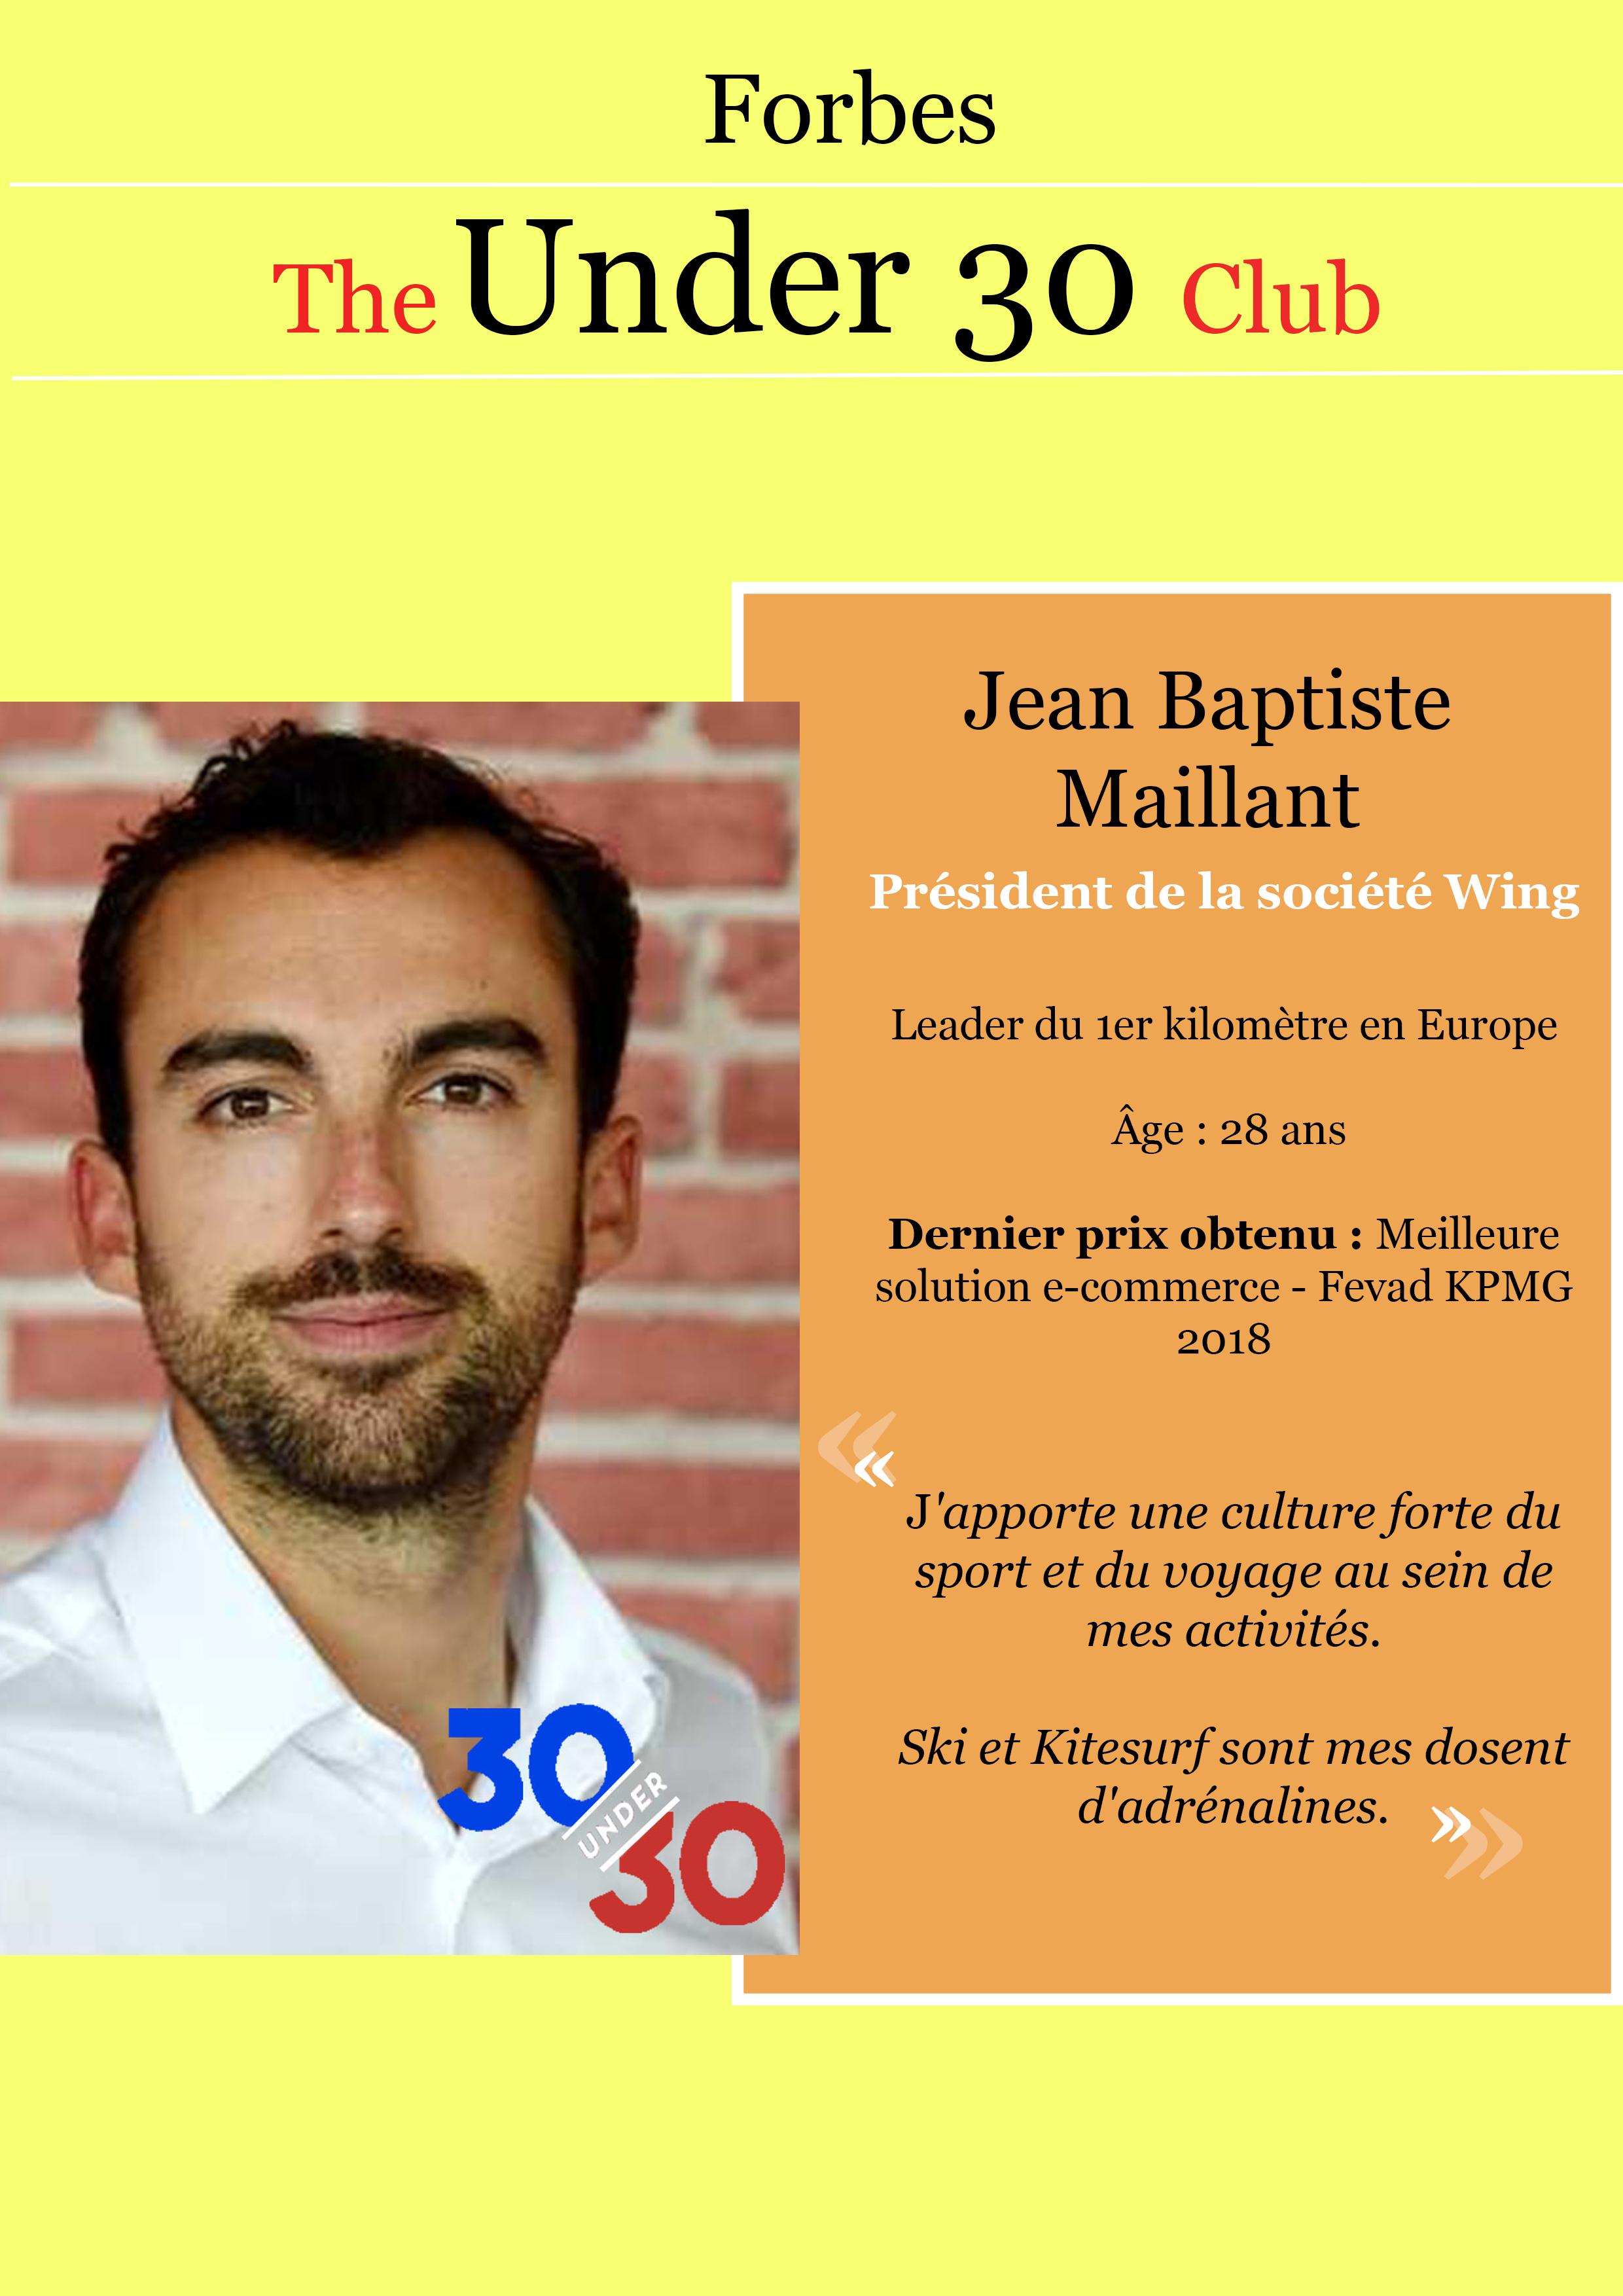 Jean Baptiste Maillant